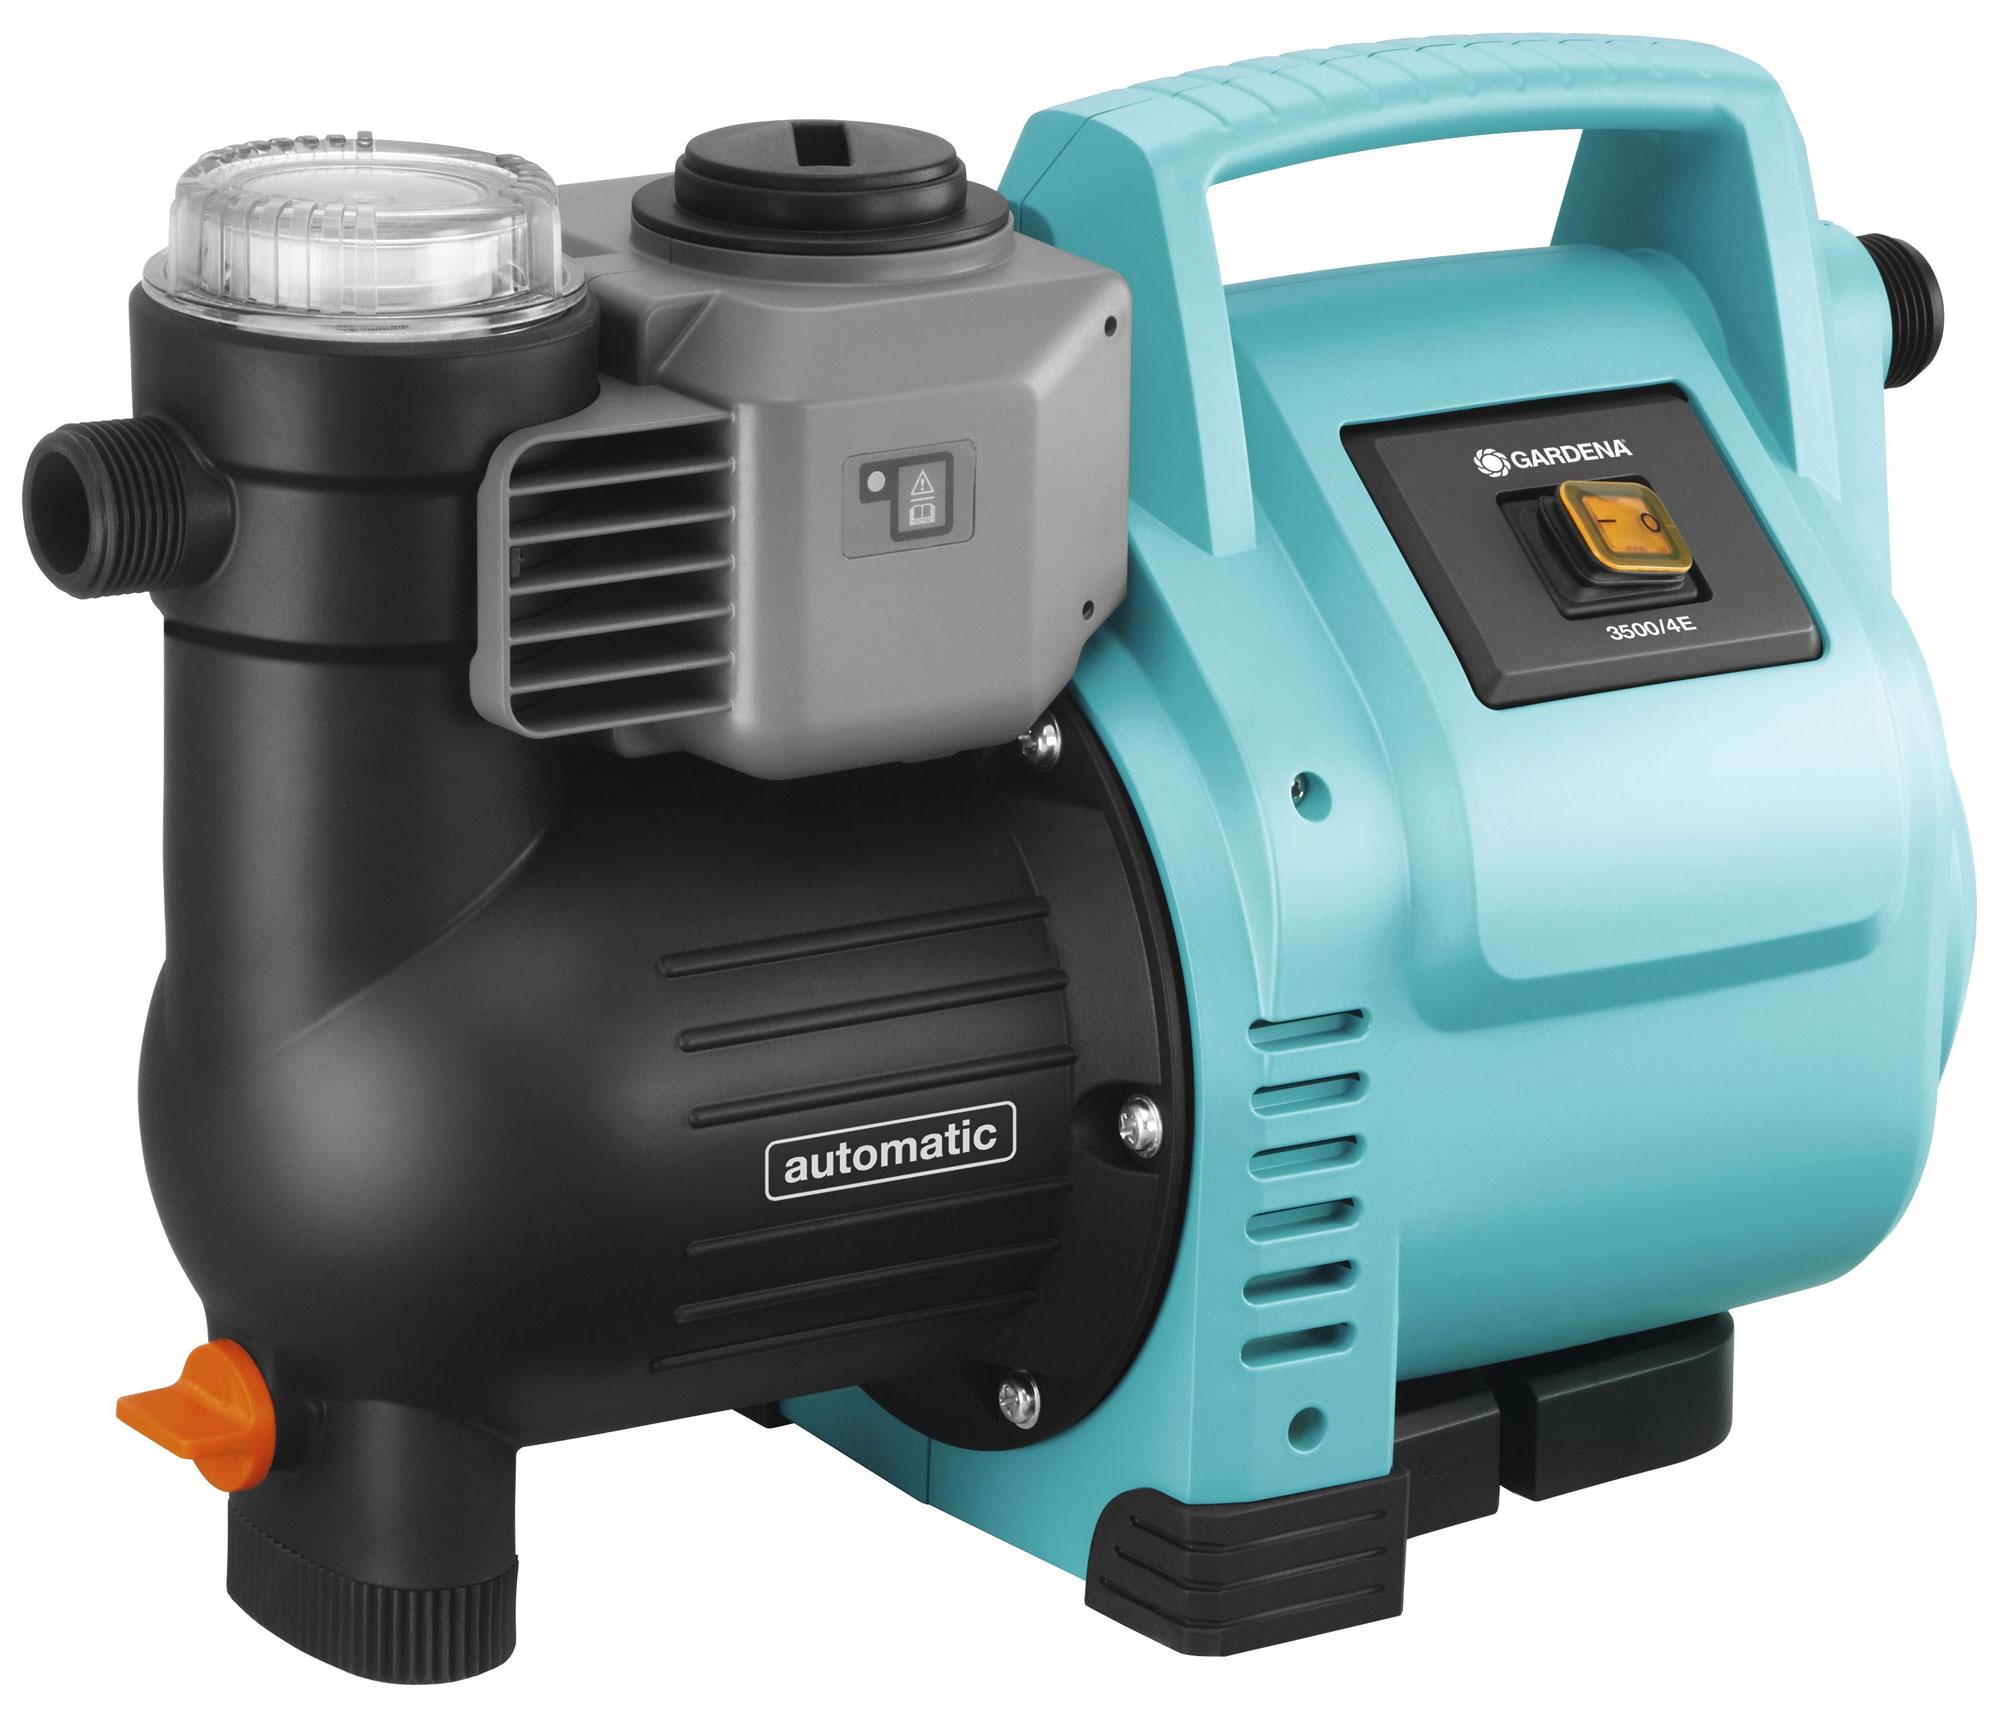 GARDENA Hauswasserautomat Classic 3500/4E 01757-20 Bild 1